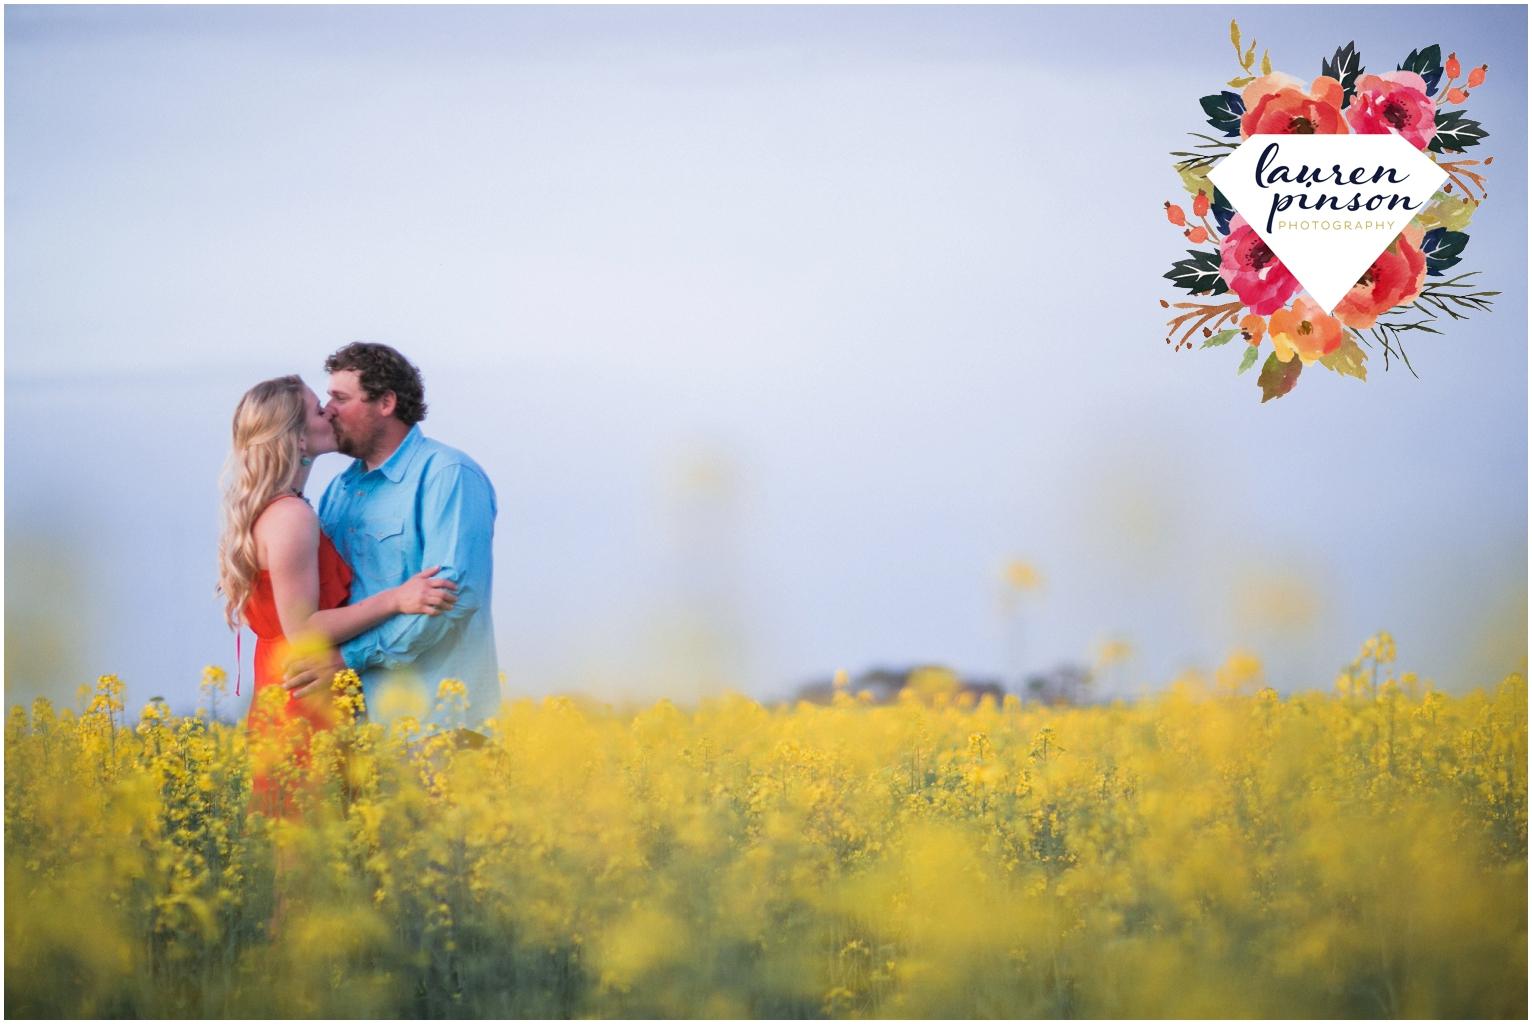 wichita-falls-wedding-photographer-engagement-session-texas-photography-oklahoma-engagement-wedding-photography_0628.jpg